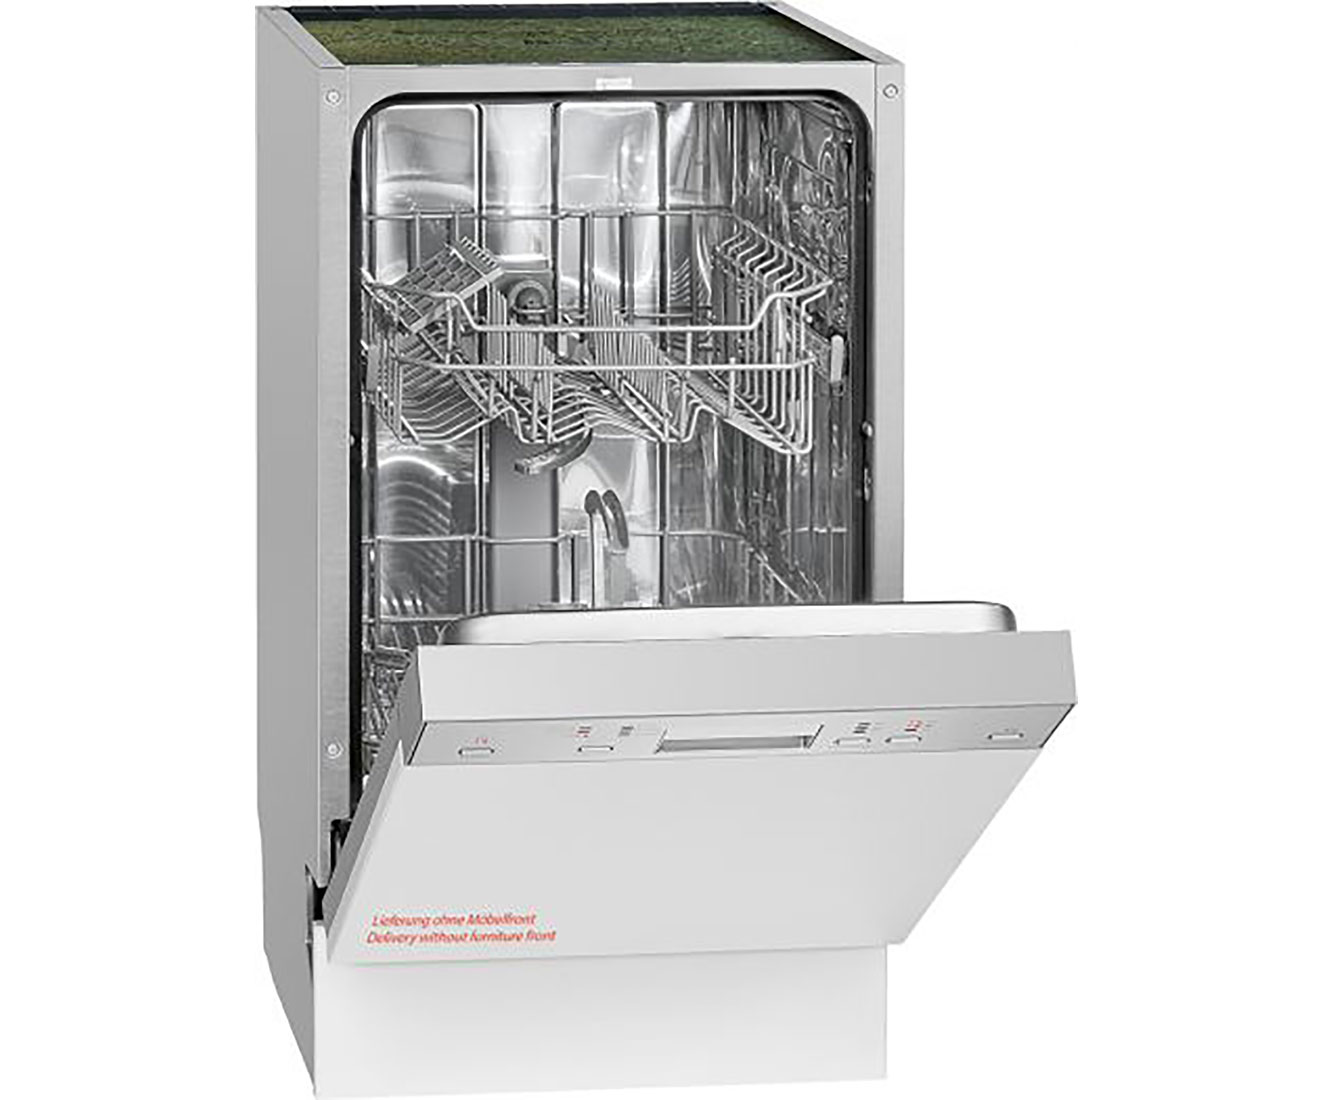 Siemens Kühlschrank Fehler E4 : Bomann geschirrspüler fehlermeldung e geschirrspüler bomann gspe